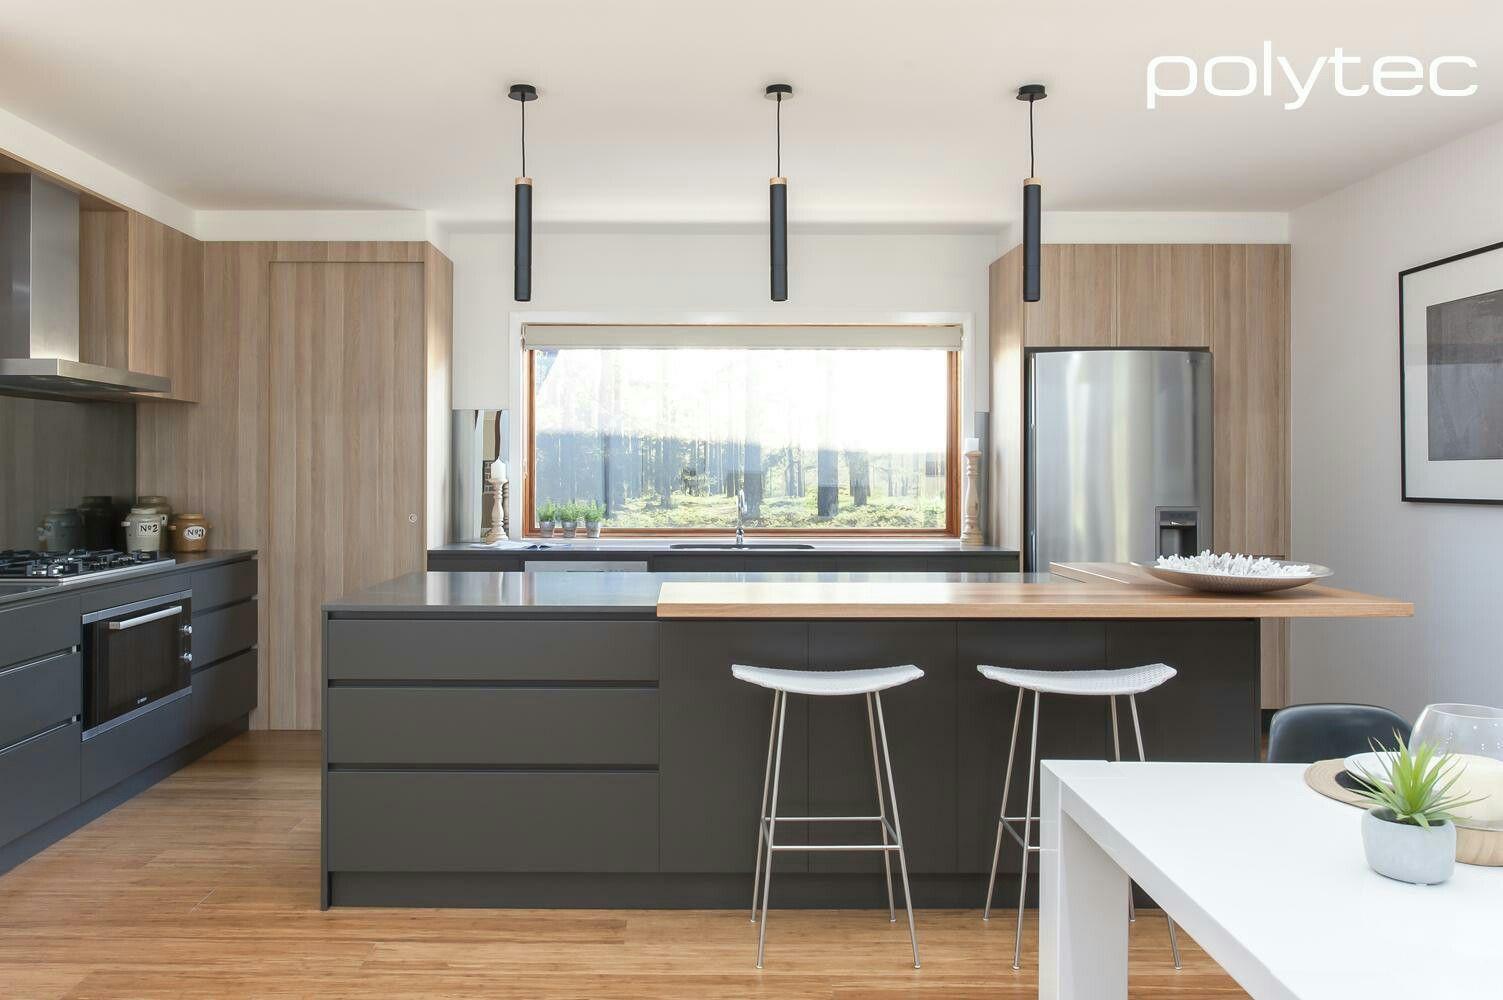 Best Polytec Cinder Matt Kitchen Design Small Home Decor 640 x 480